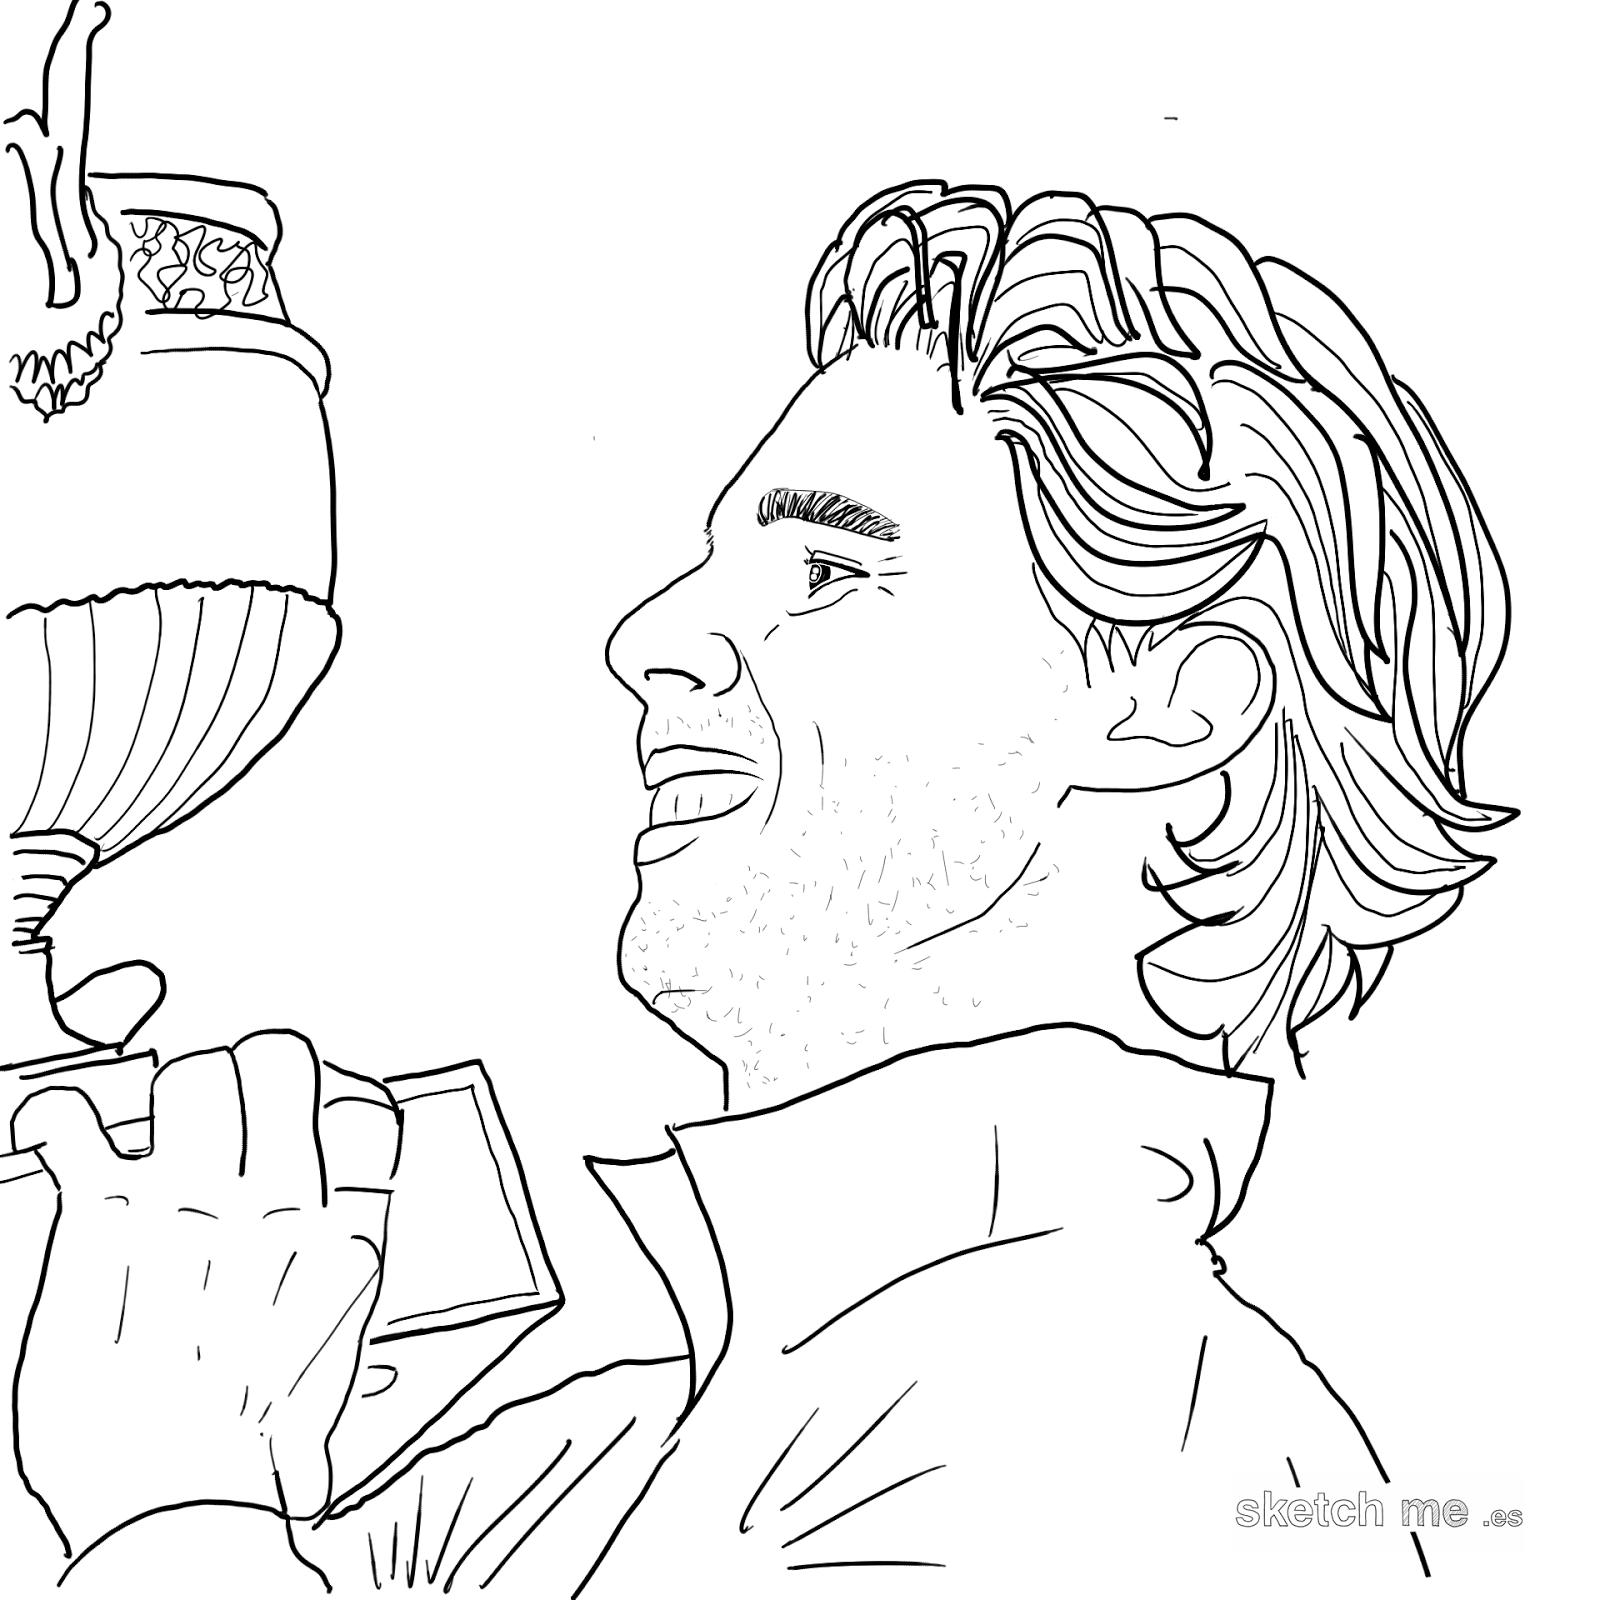 rafa-nadal-sketch-me-retratos-personalizados-dibujados-a-mano-para-facebook-twitter-whatsapp